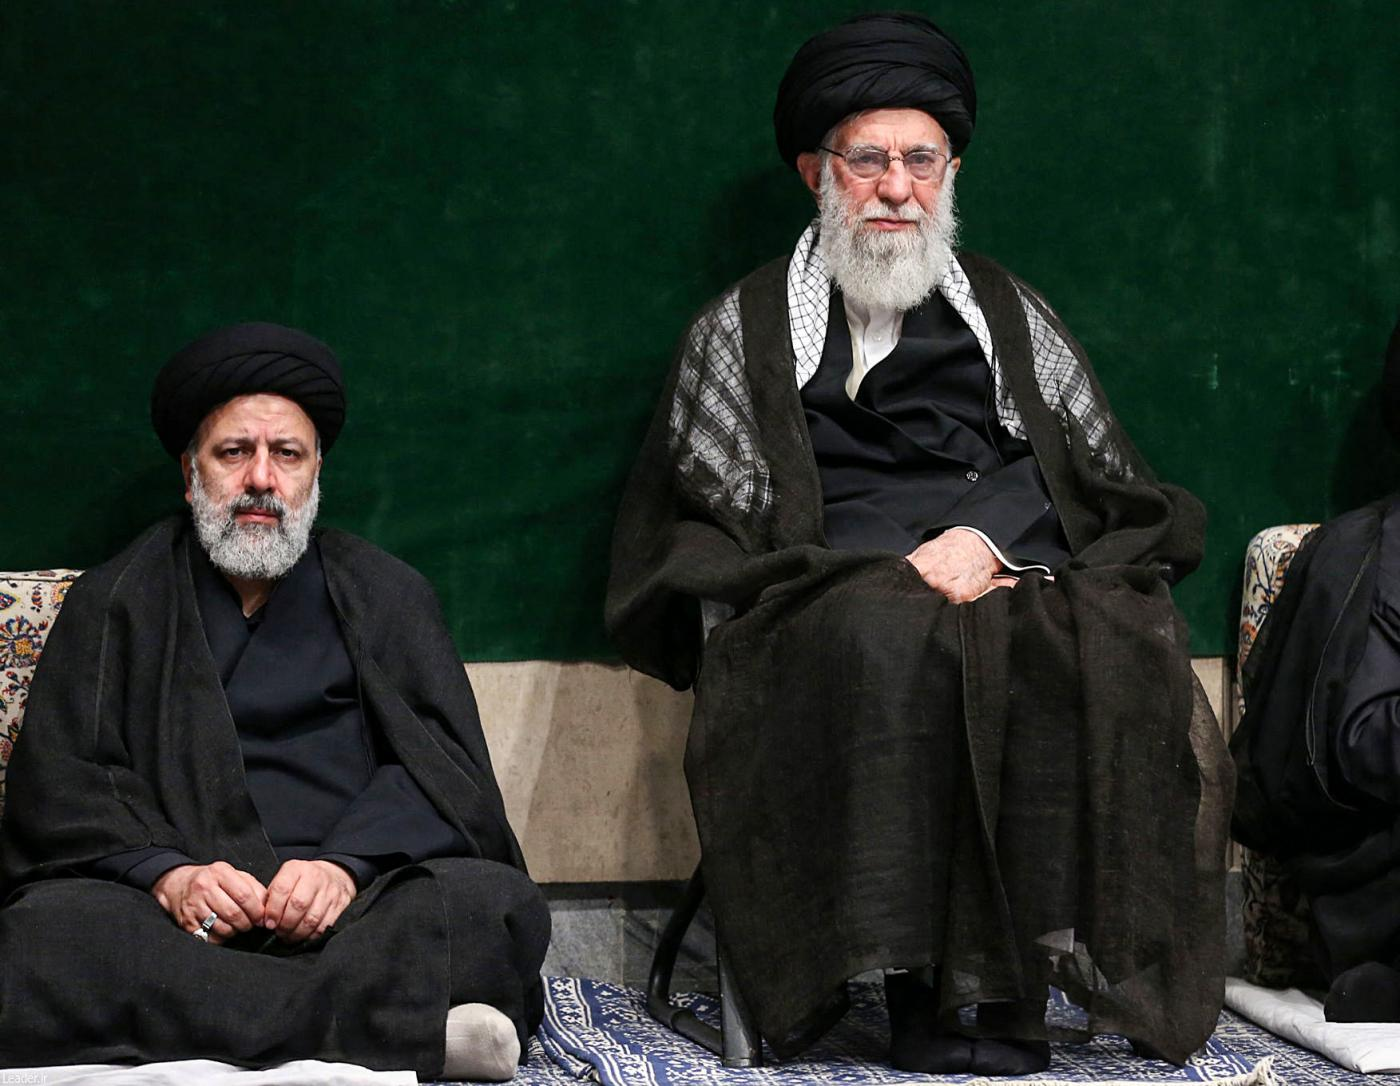 Ebrahim Raisi: The new Iranian president who always follows orders   Middle East Eye